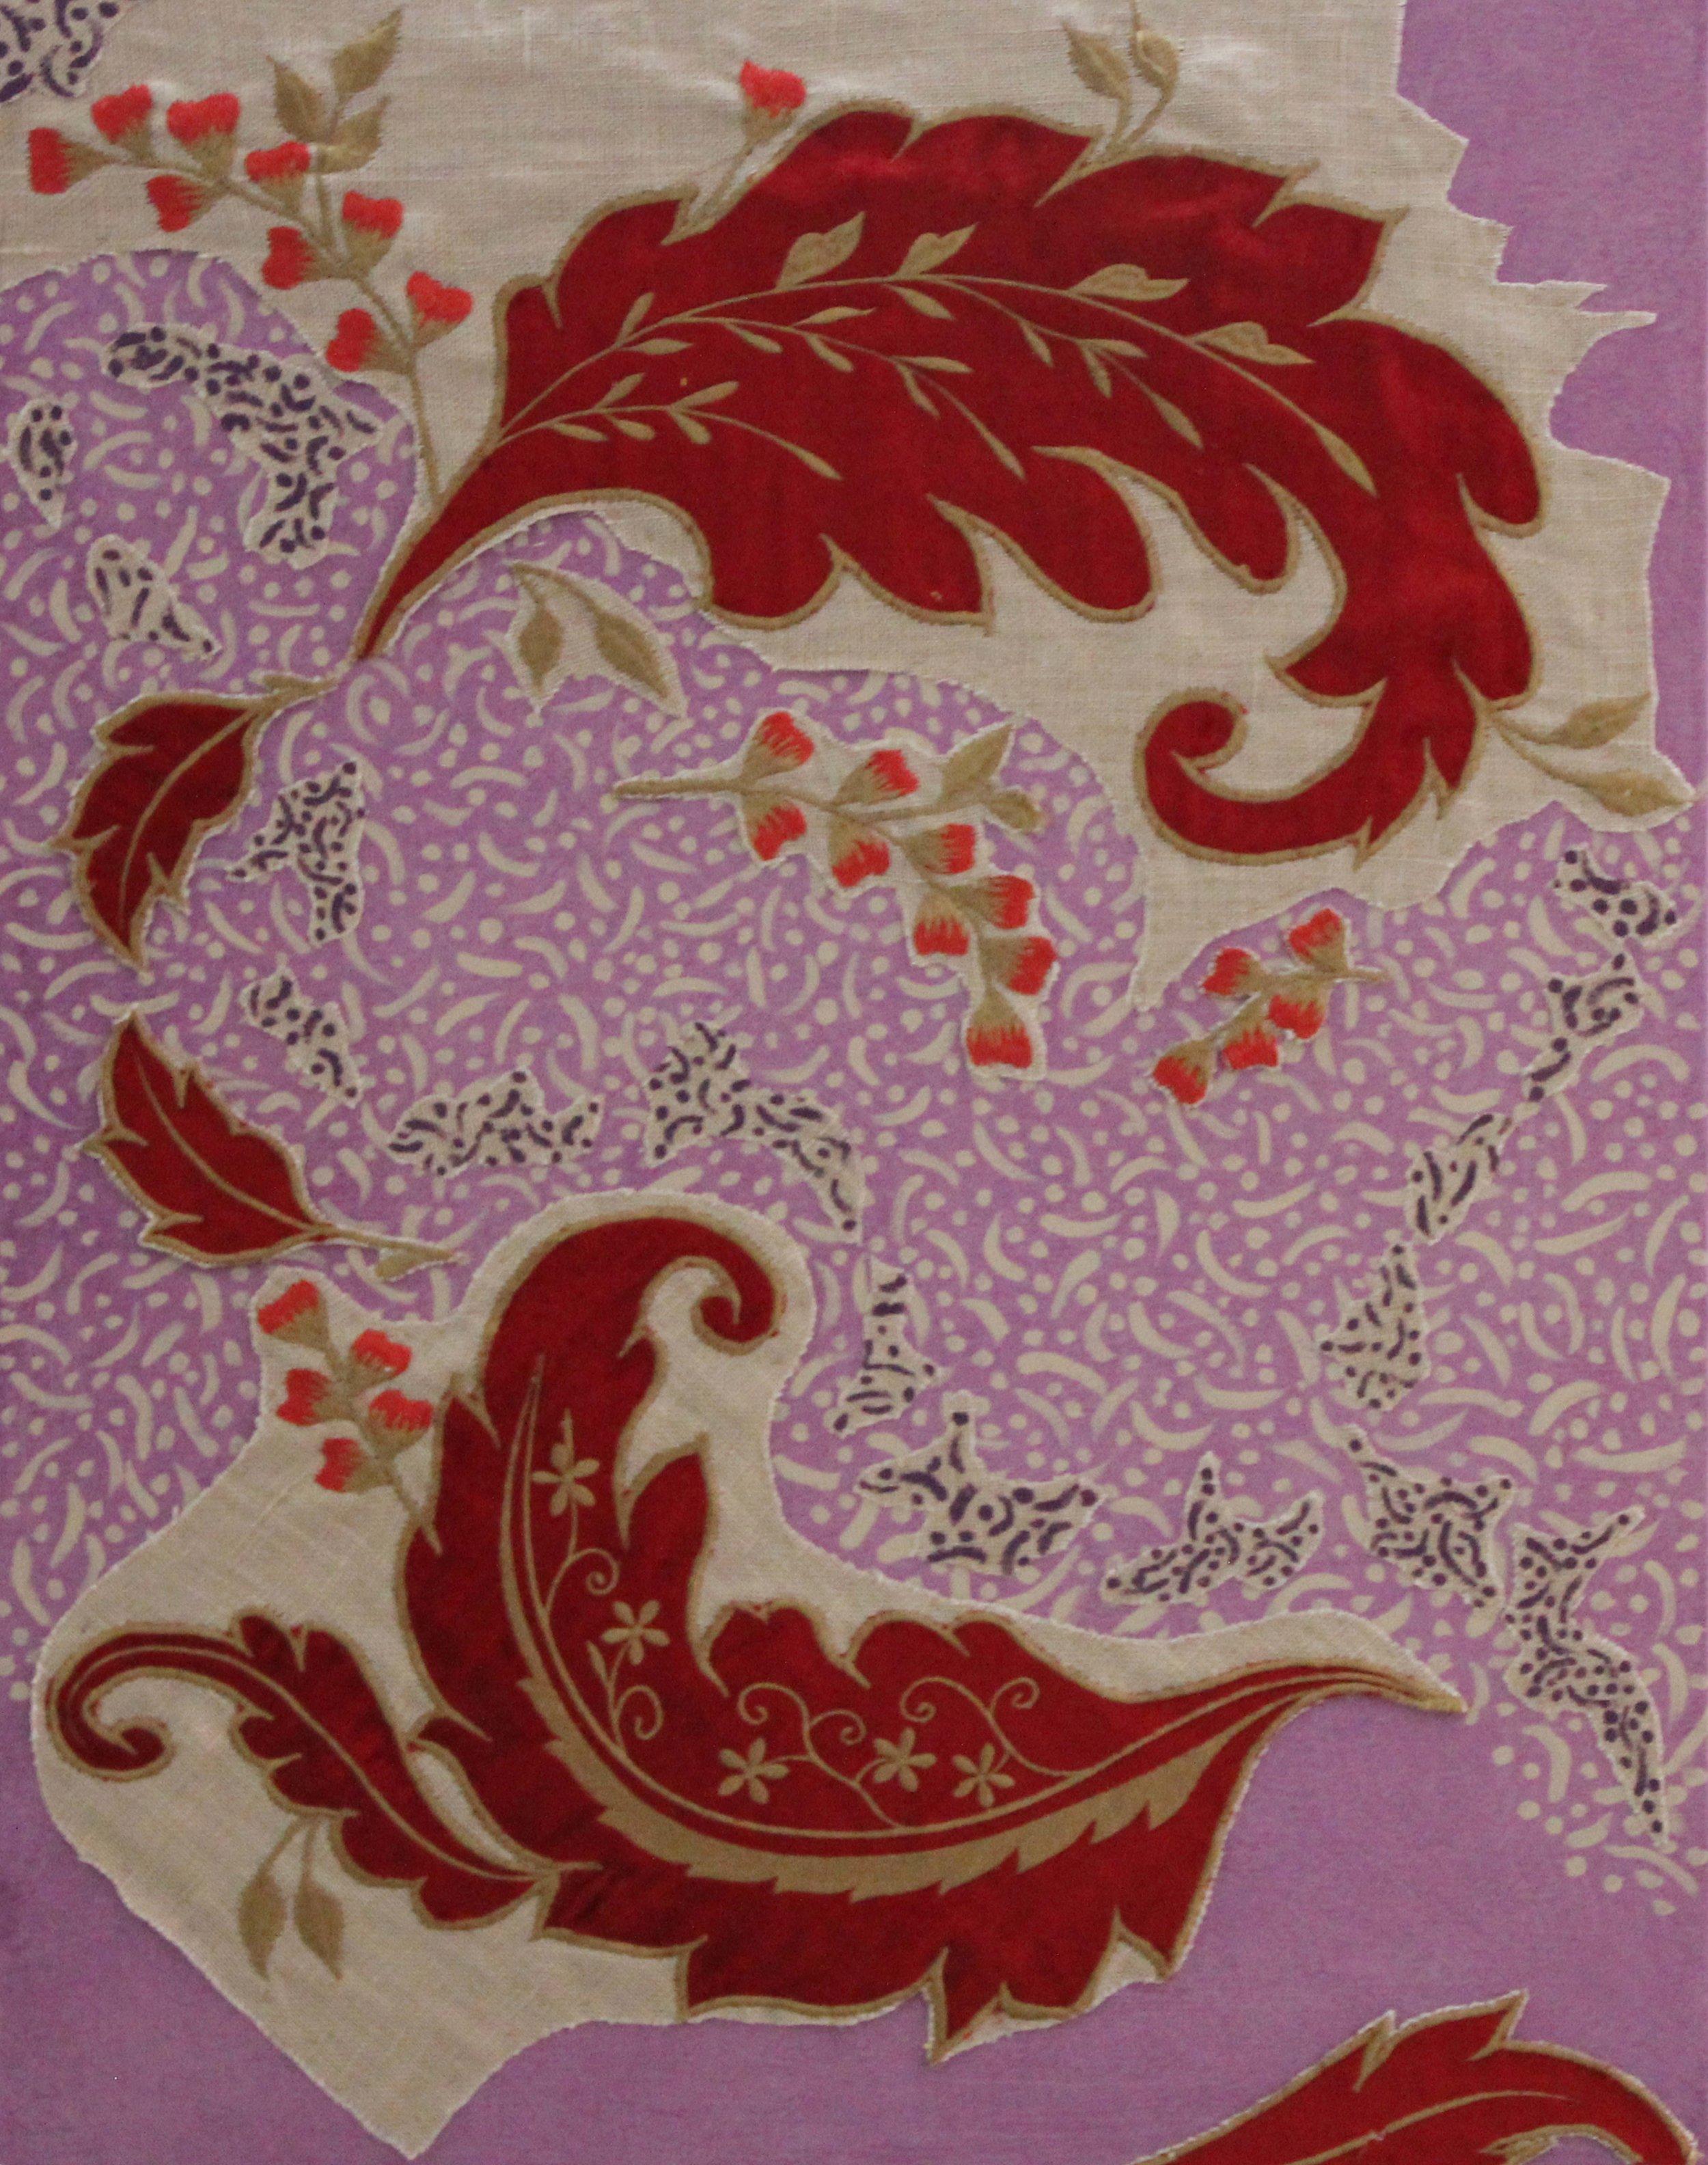 Red Velvet Floating in Violet Sky